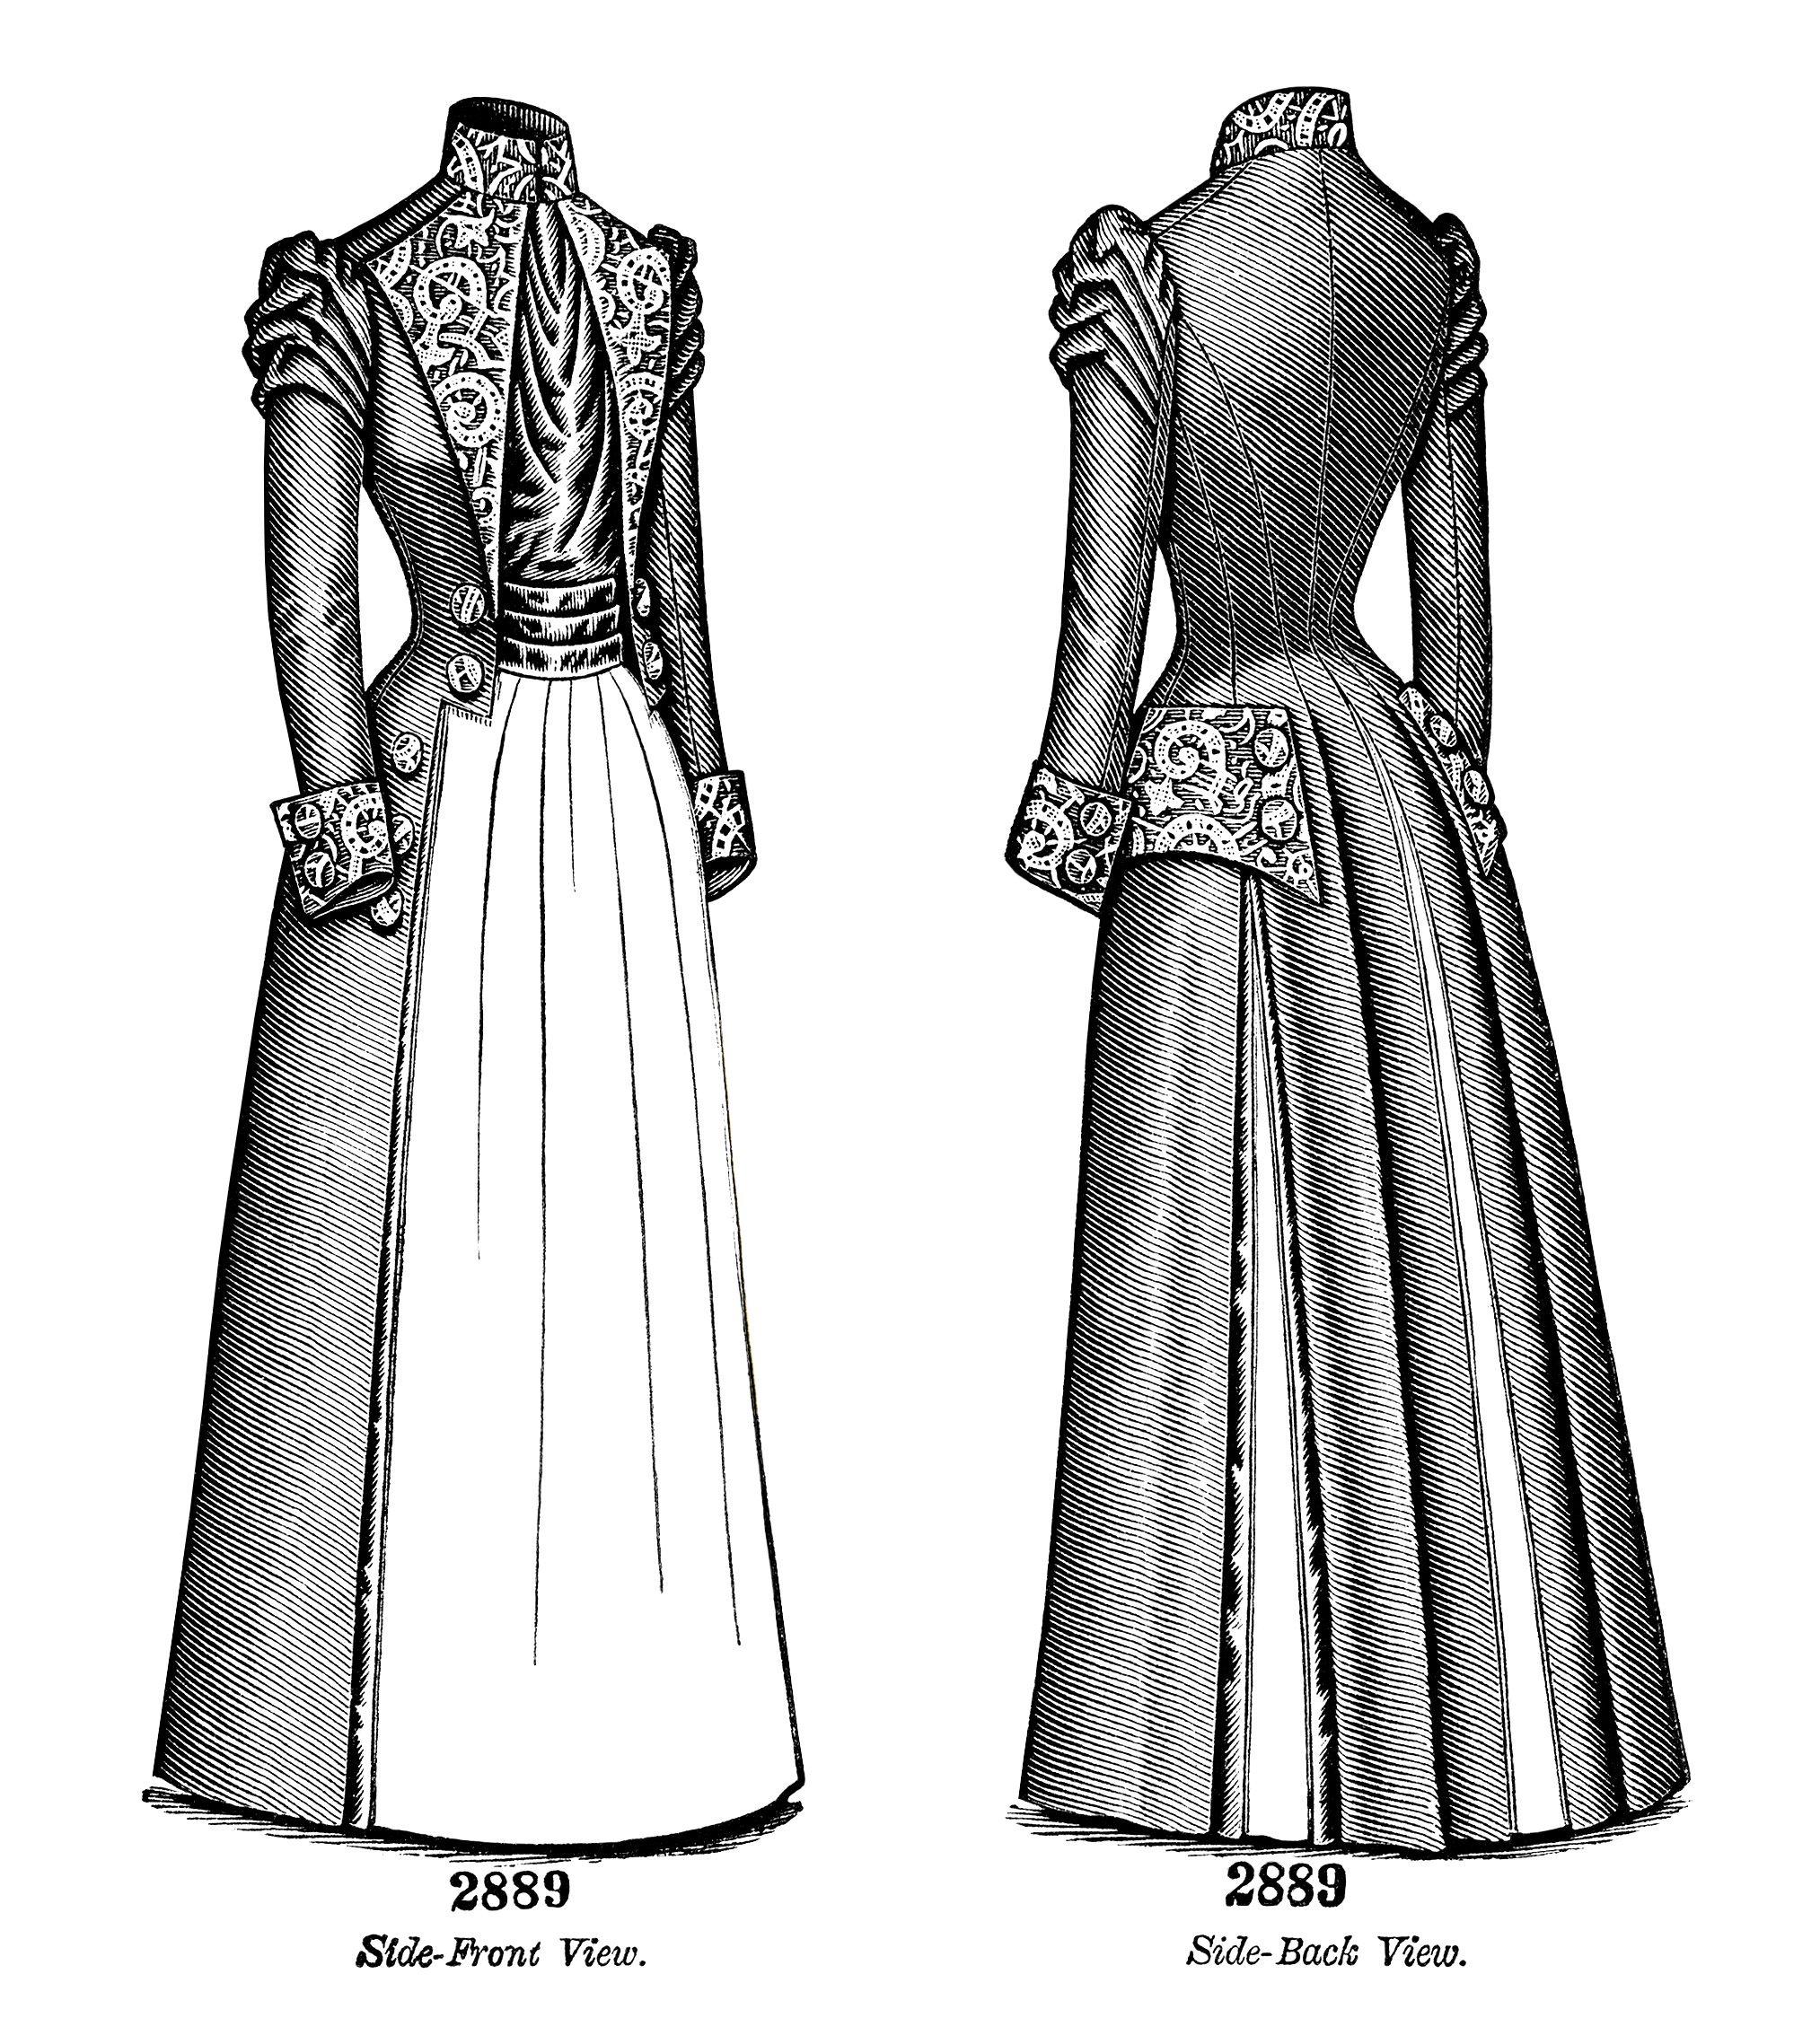 Victorian Ladies Coat Polonaise Free Clip Art Black And White Clip Art Version Fashion Clipart Victorian Women Coats For Women